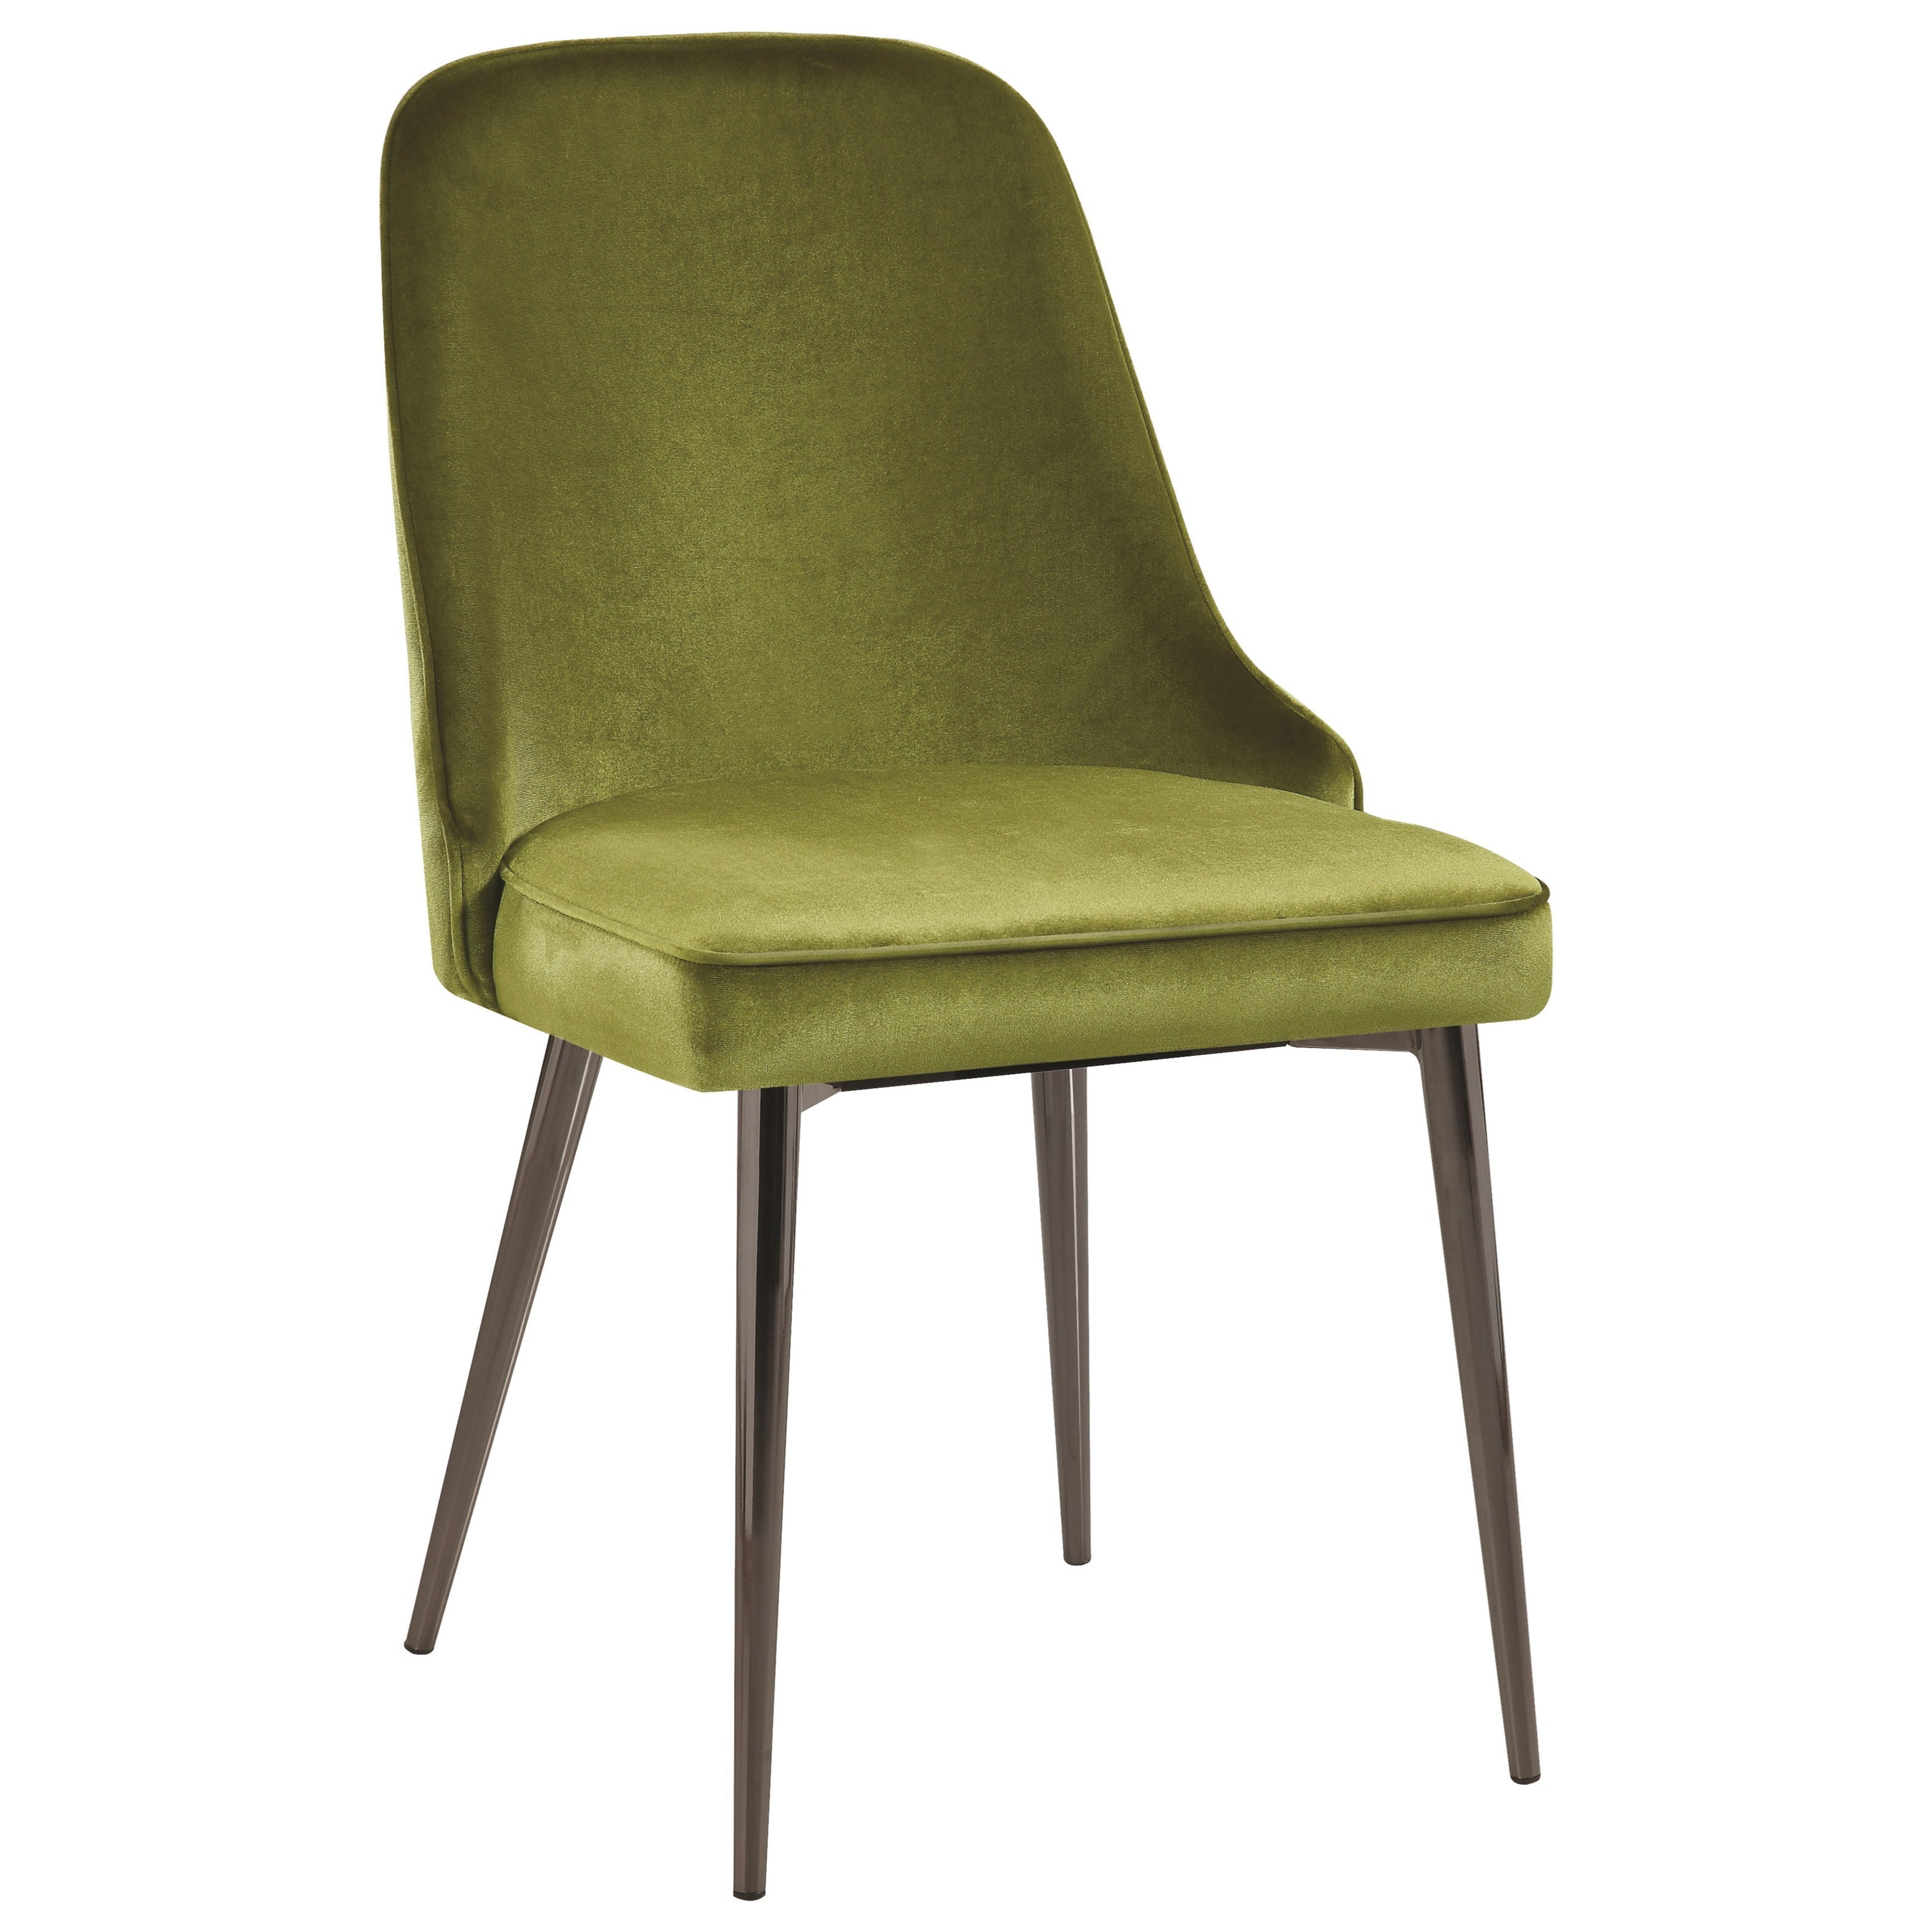 Scott Living 10795 Dining Chair - Item Number: 107952